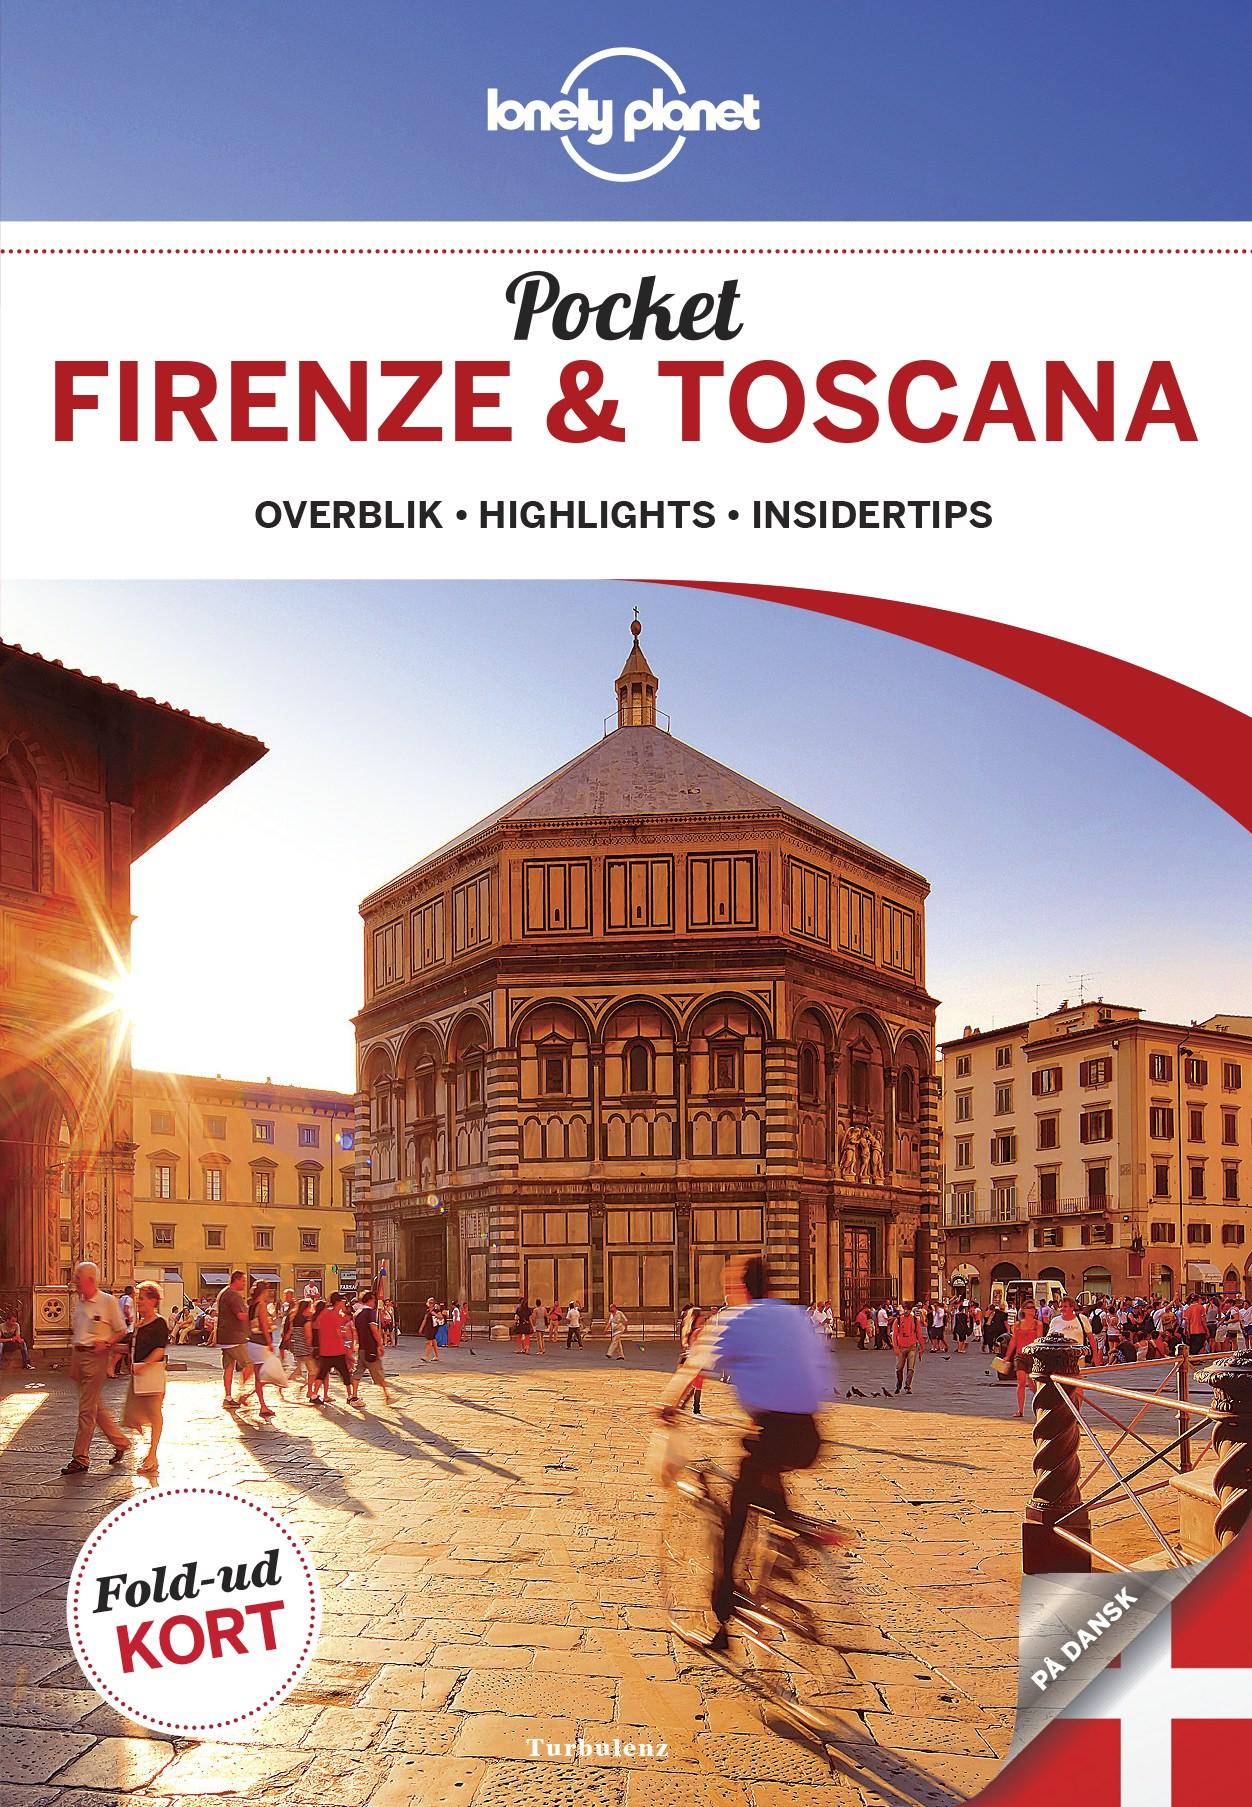 Pocket Firenze & Toscana